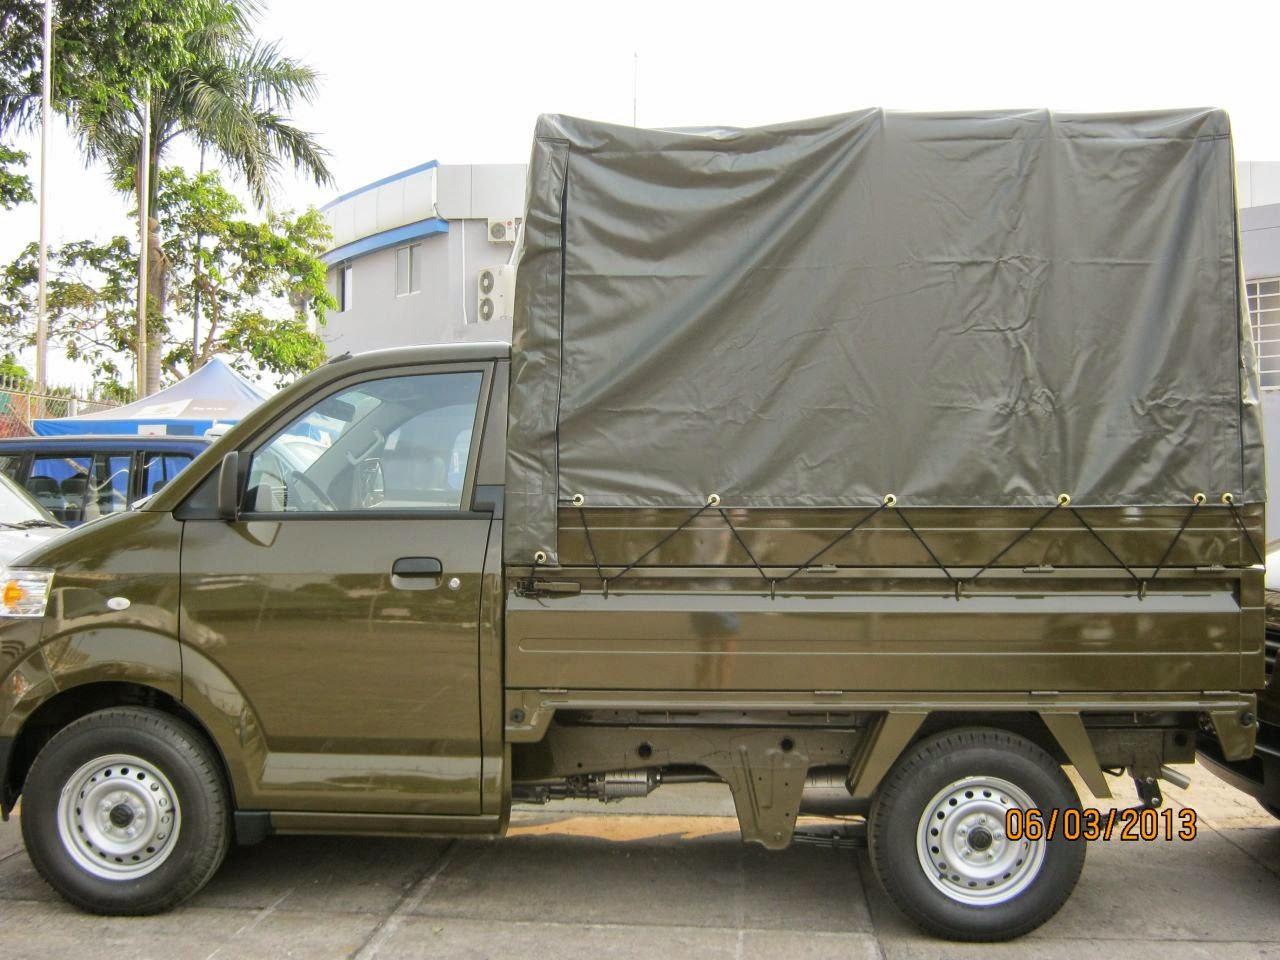 mua xe tải Suzuki ở đâu ảnh số 7